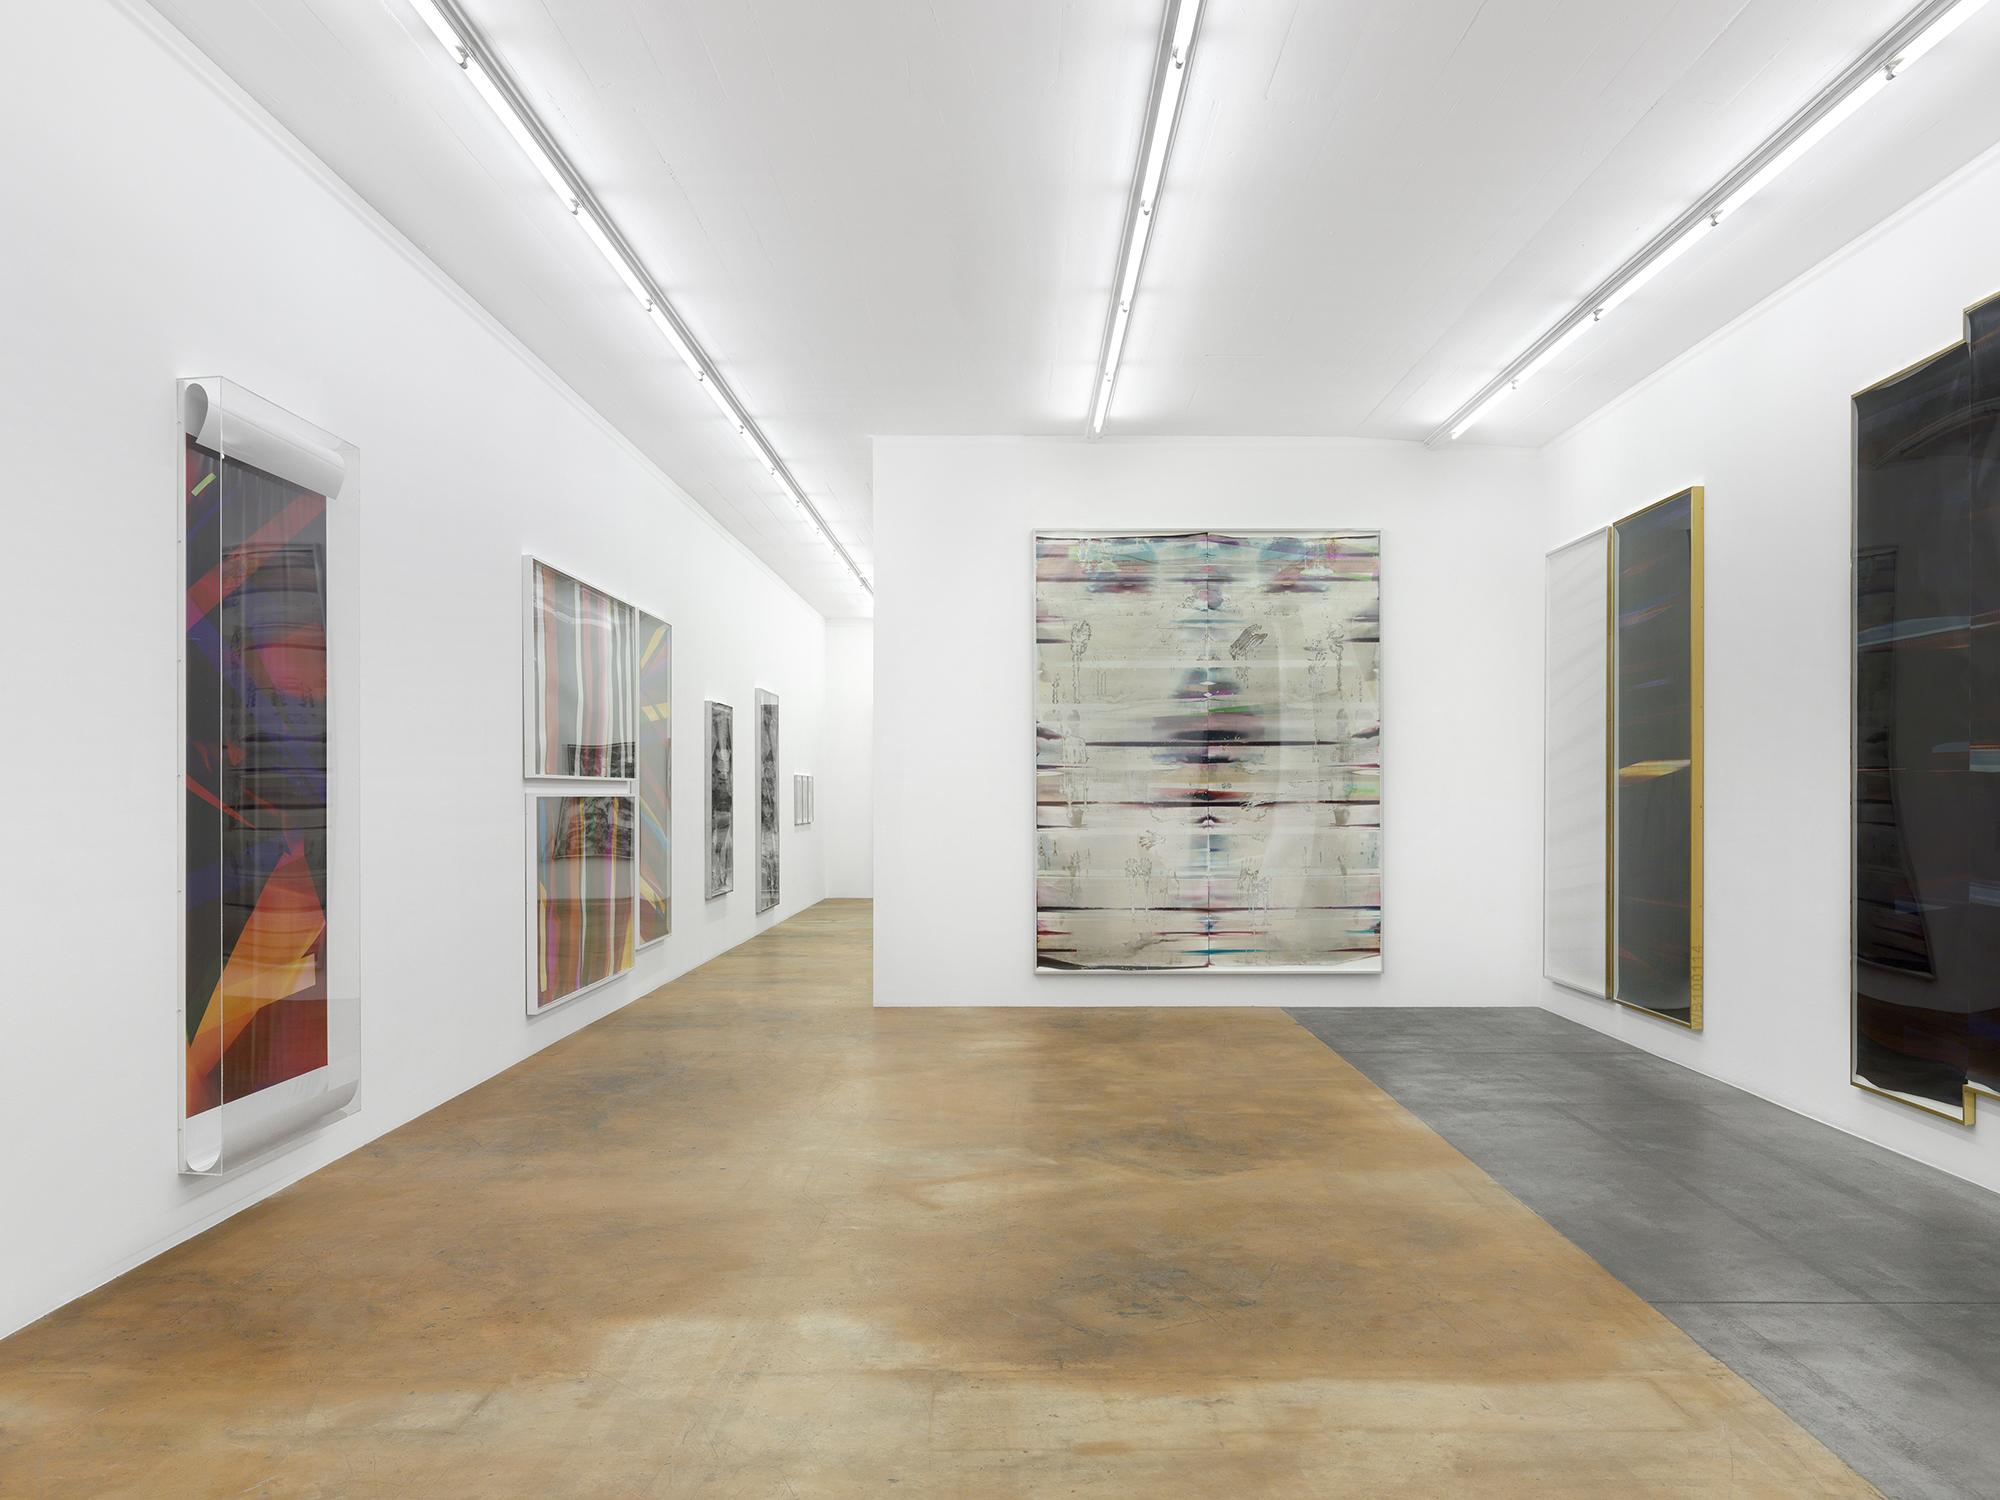 Musée d'art moderne et contemporain  Geneva  Switzerland  2019